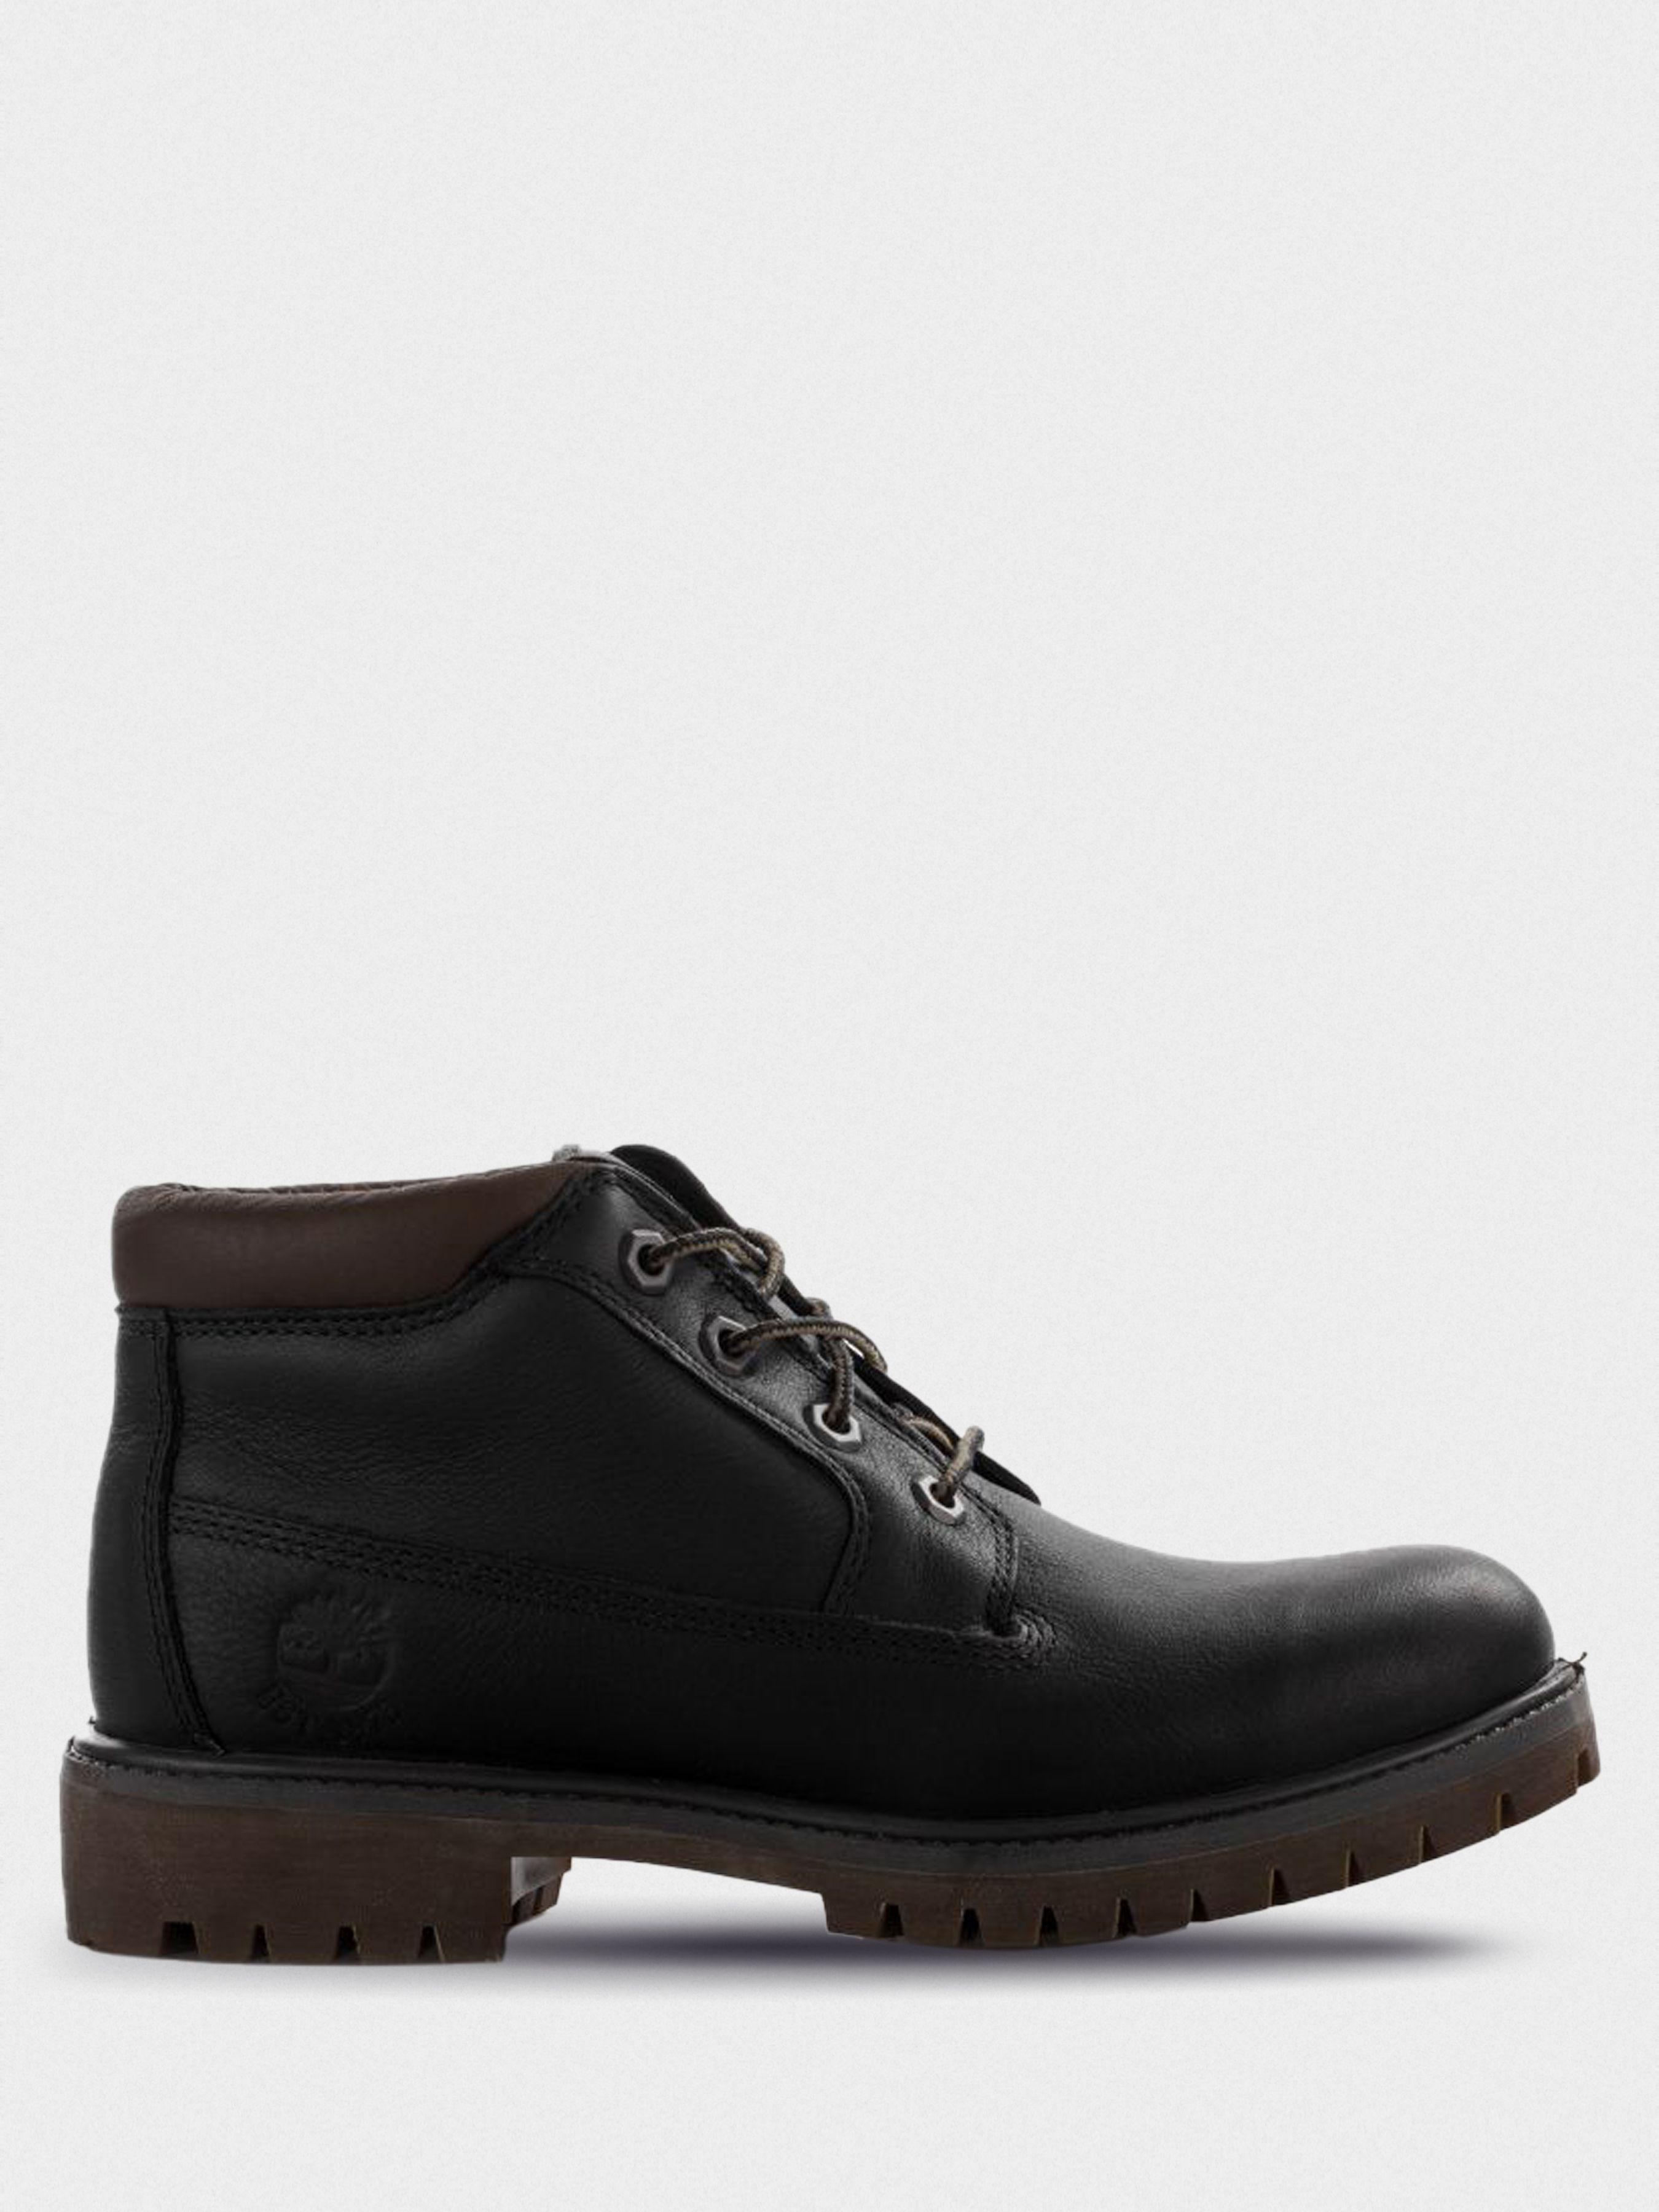 Ботинки для мужчин Timberland Premium WP Chukka TF3834 брендовая обувь, 2017